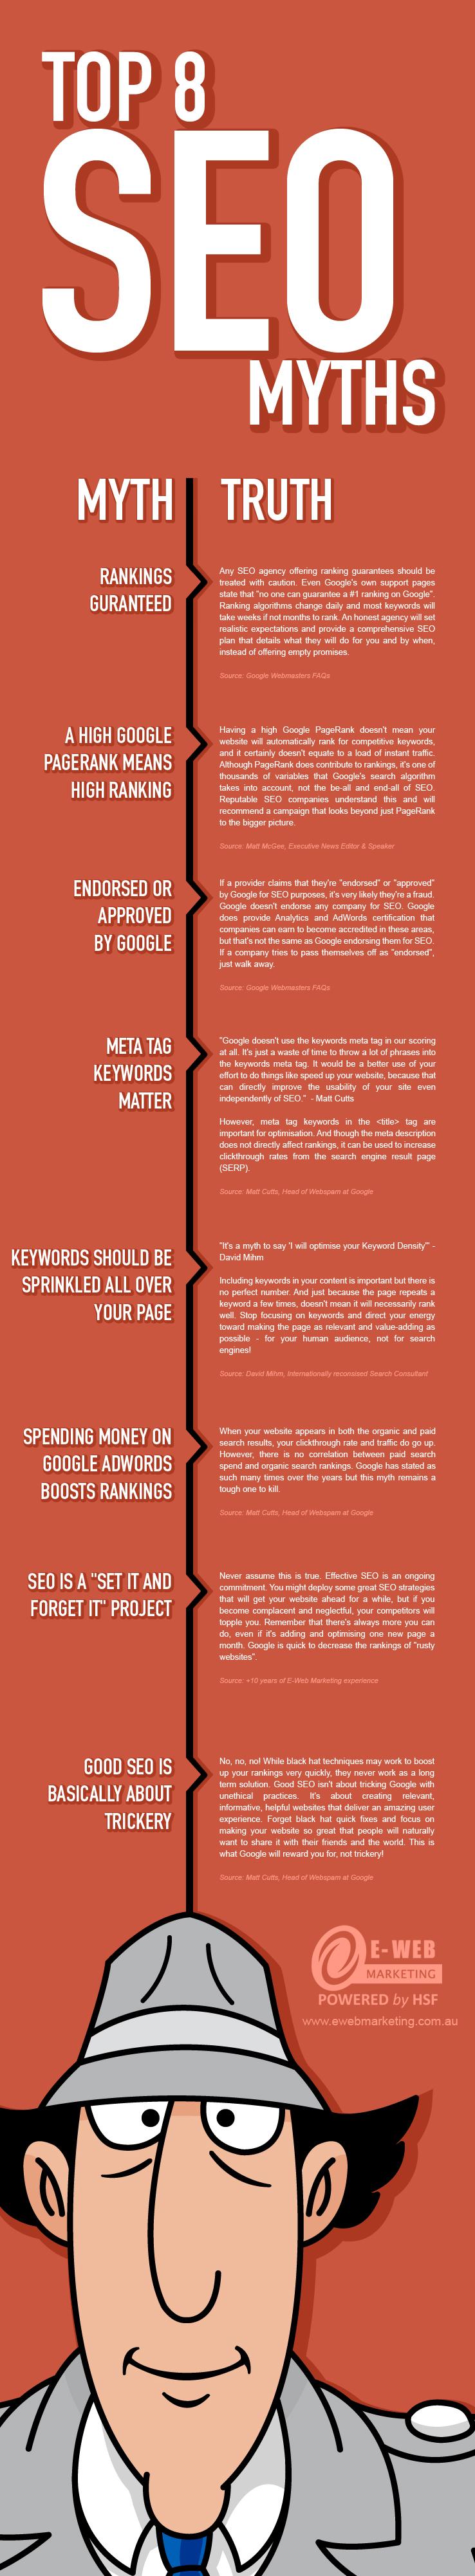 Top 8 SEO Myths Exposed!